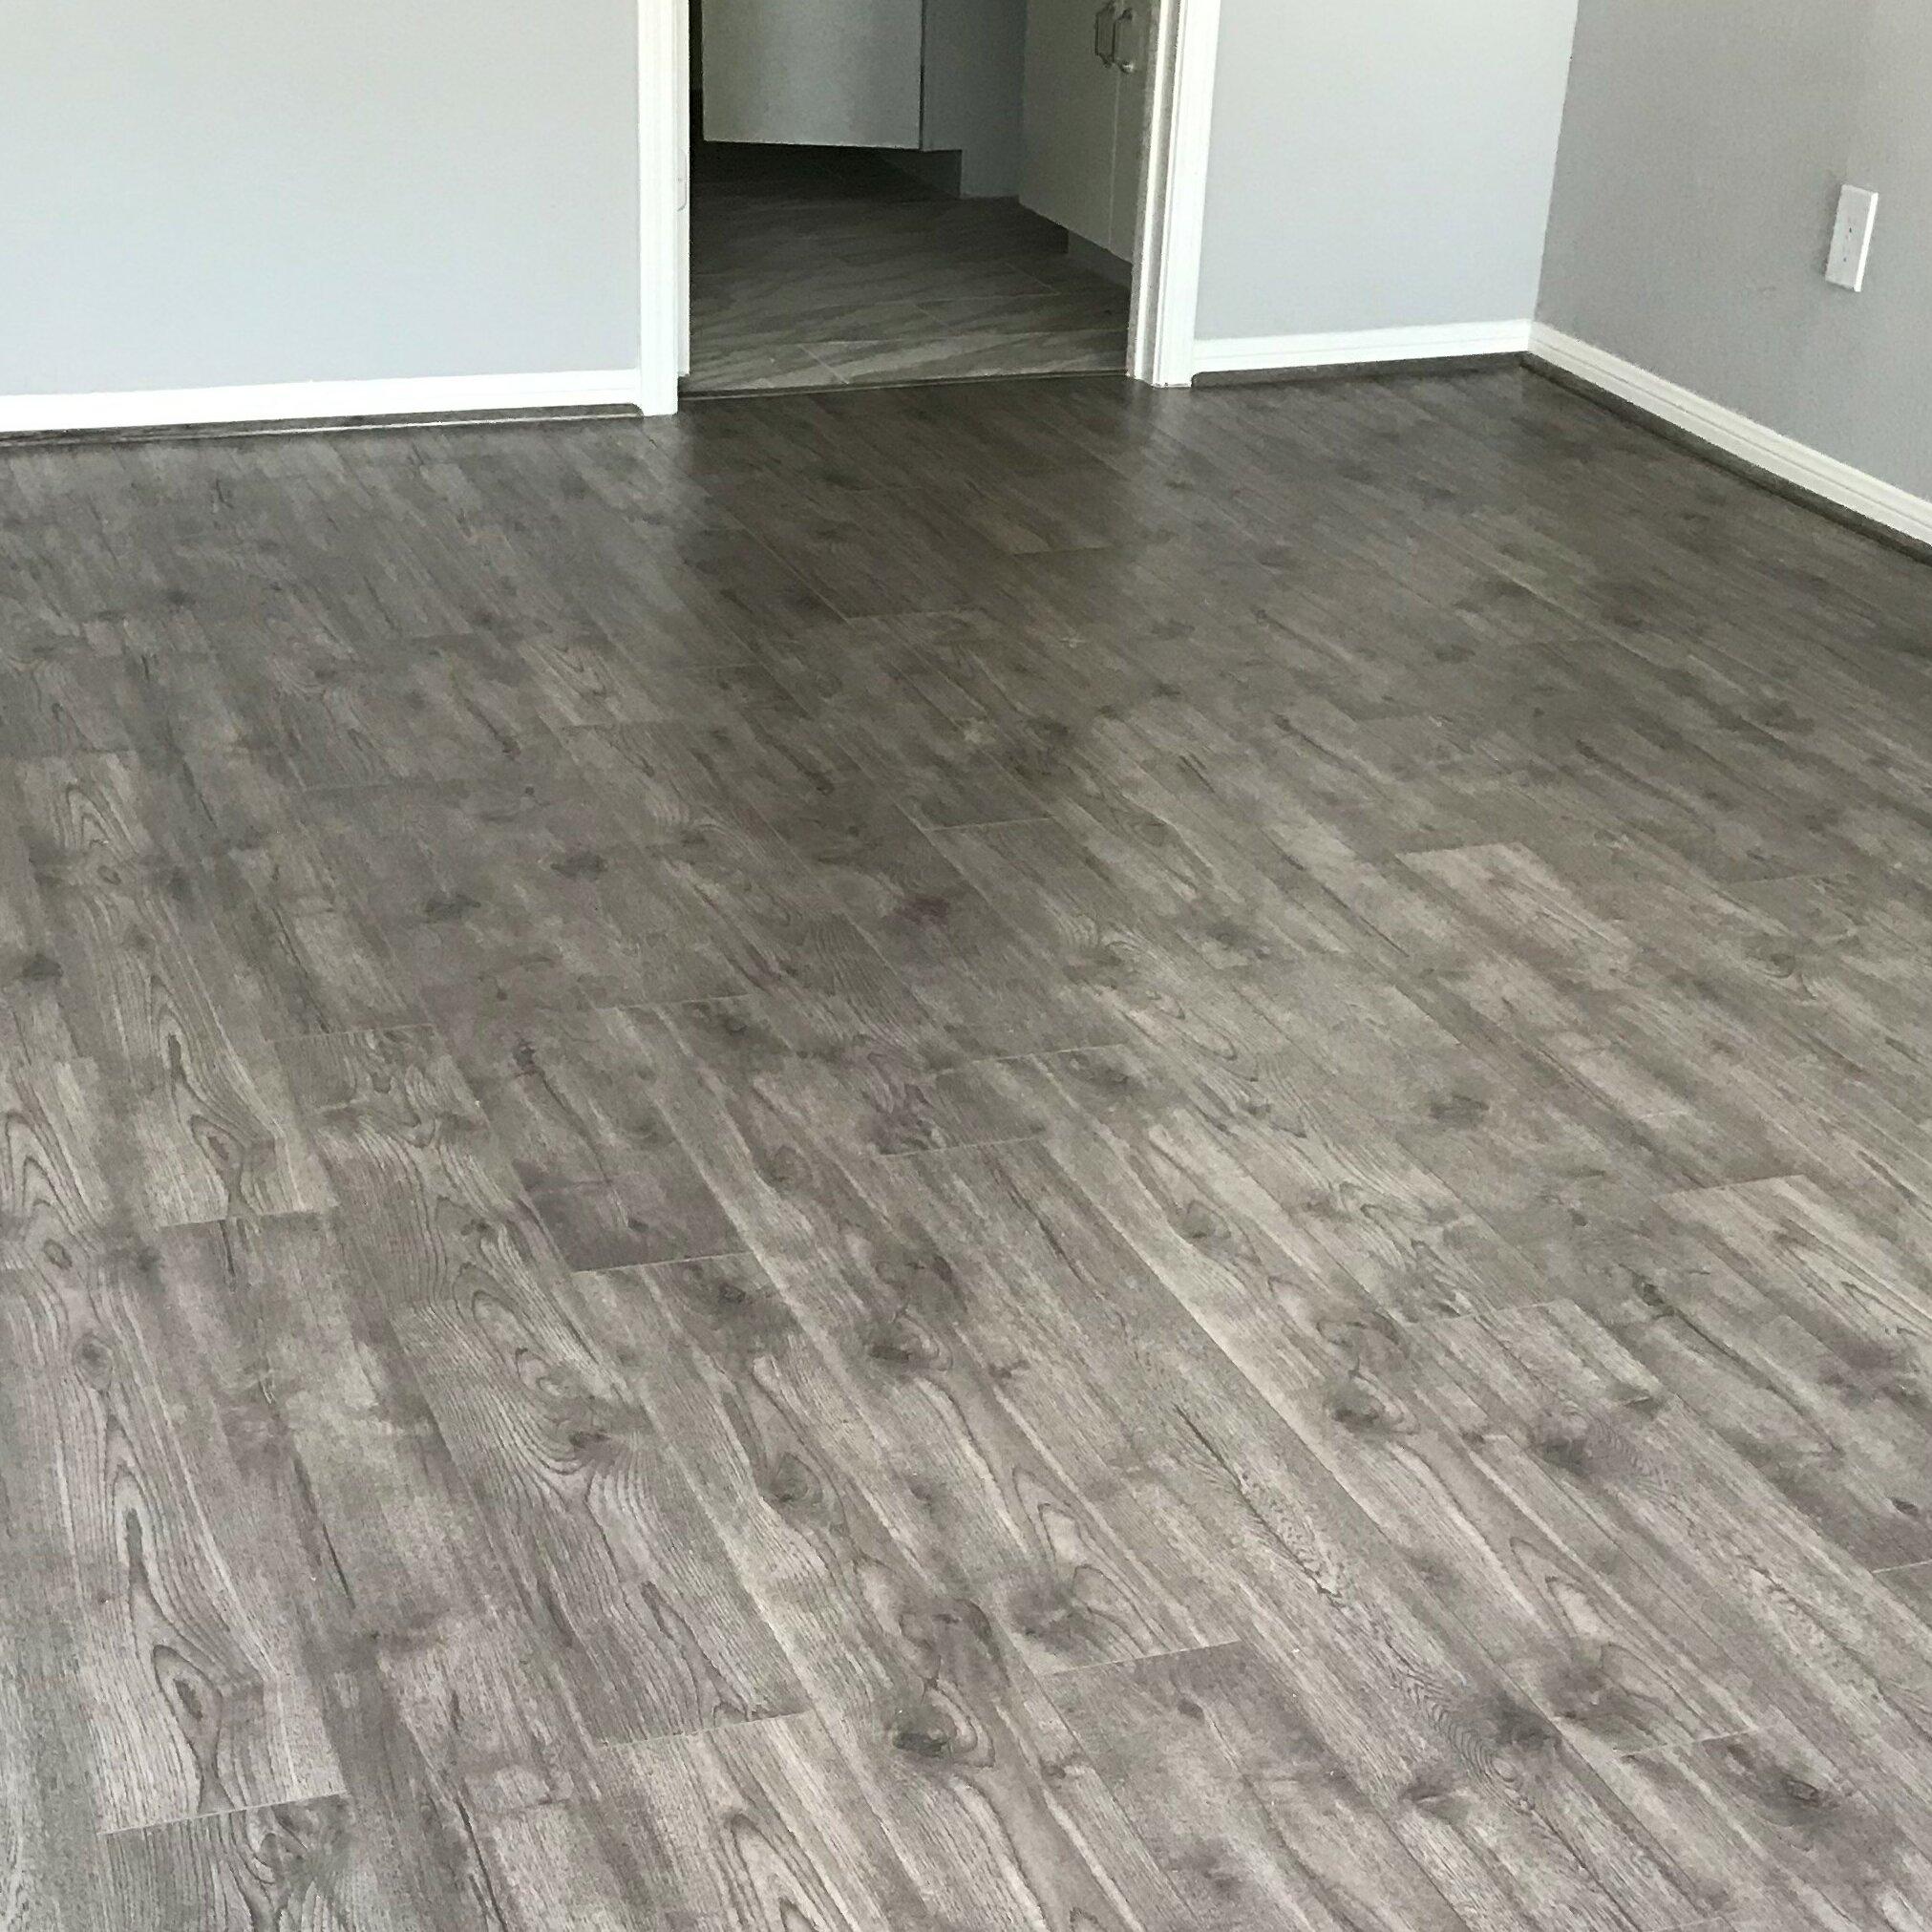 X 48 12mm Oak Laminate Flooring